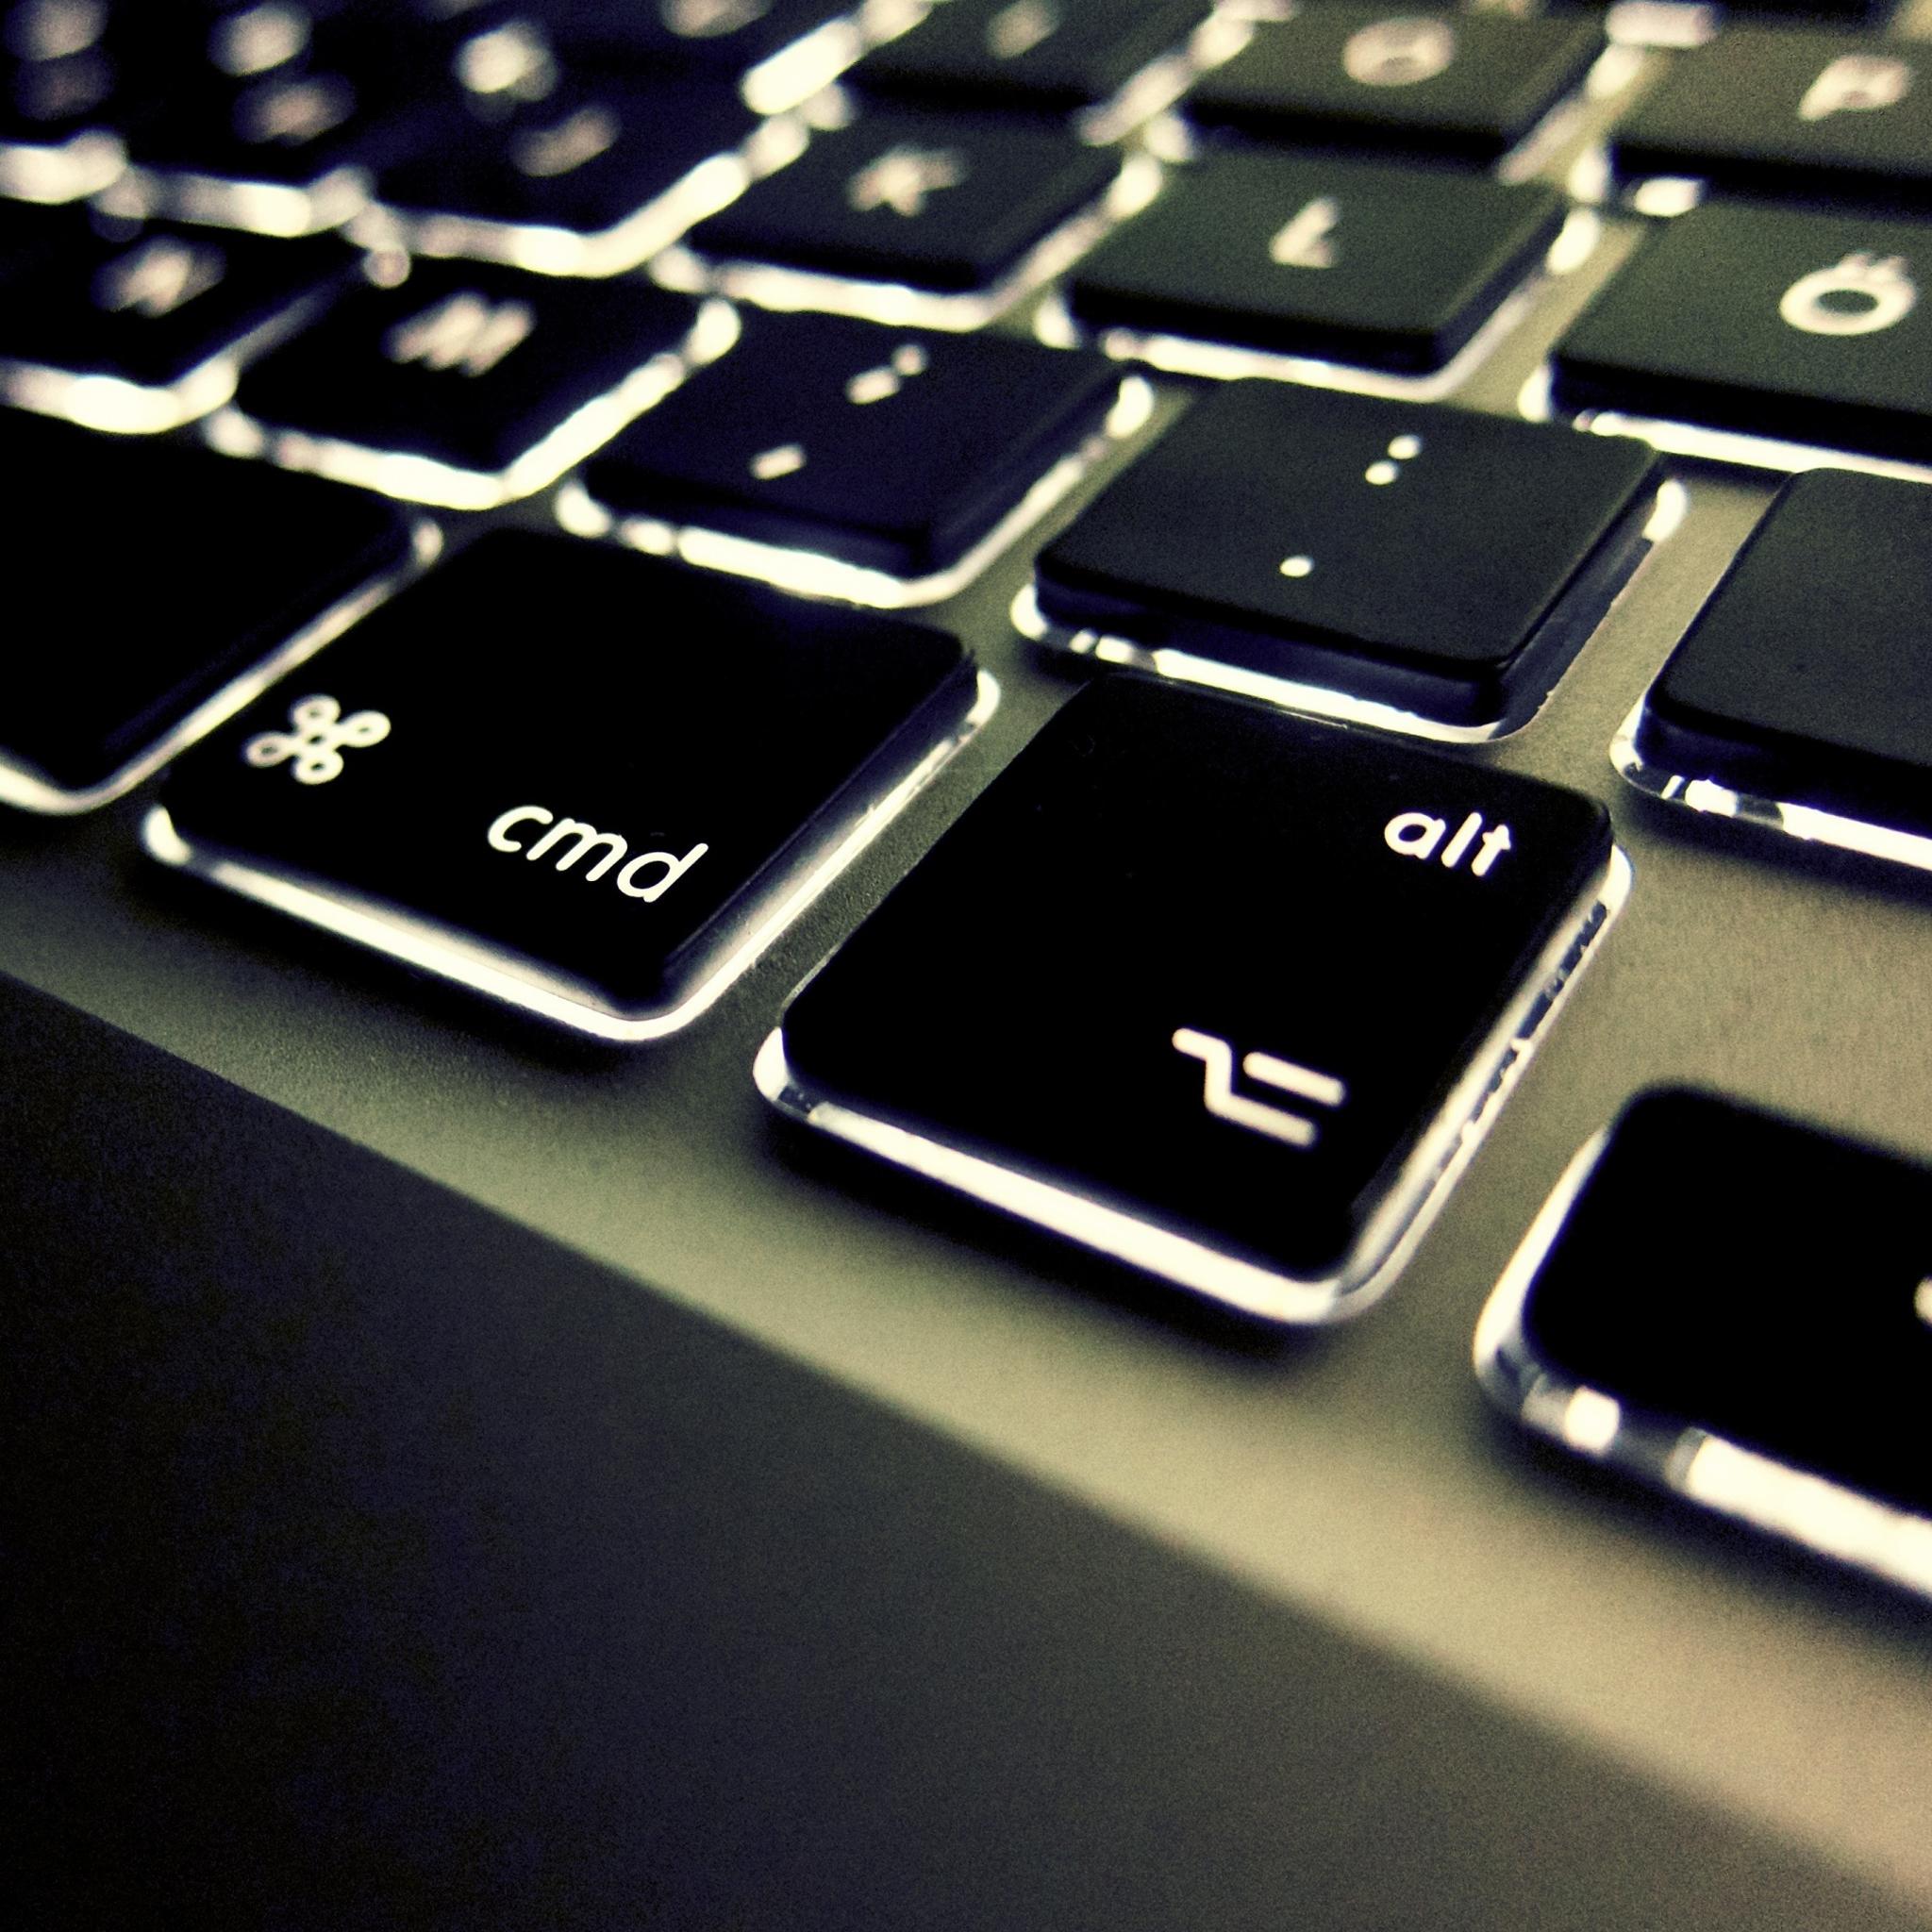 Keyboard Lighted 3Wallpapers iPad Retina Keyboard Lighted   iPad Retina